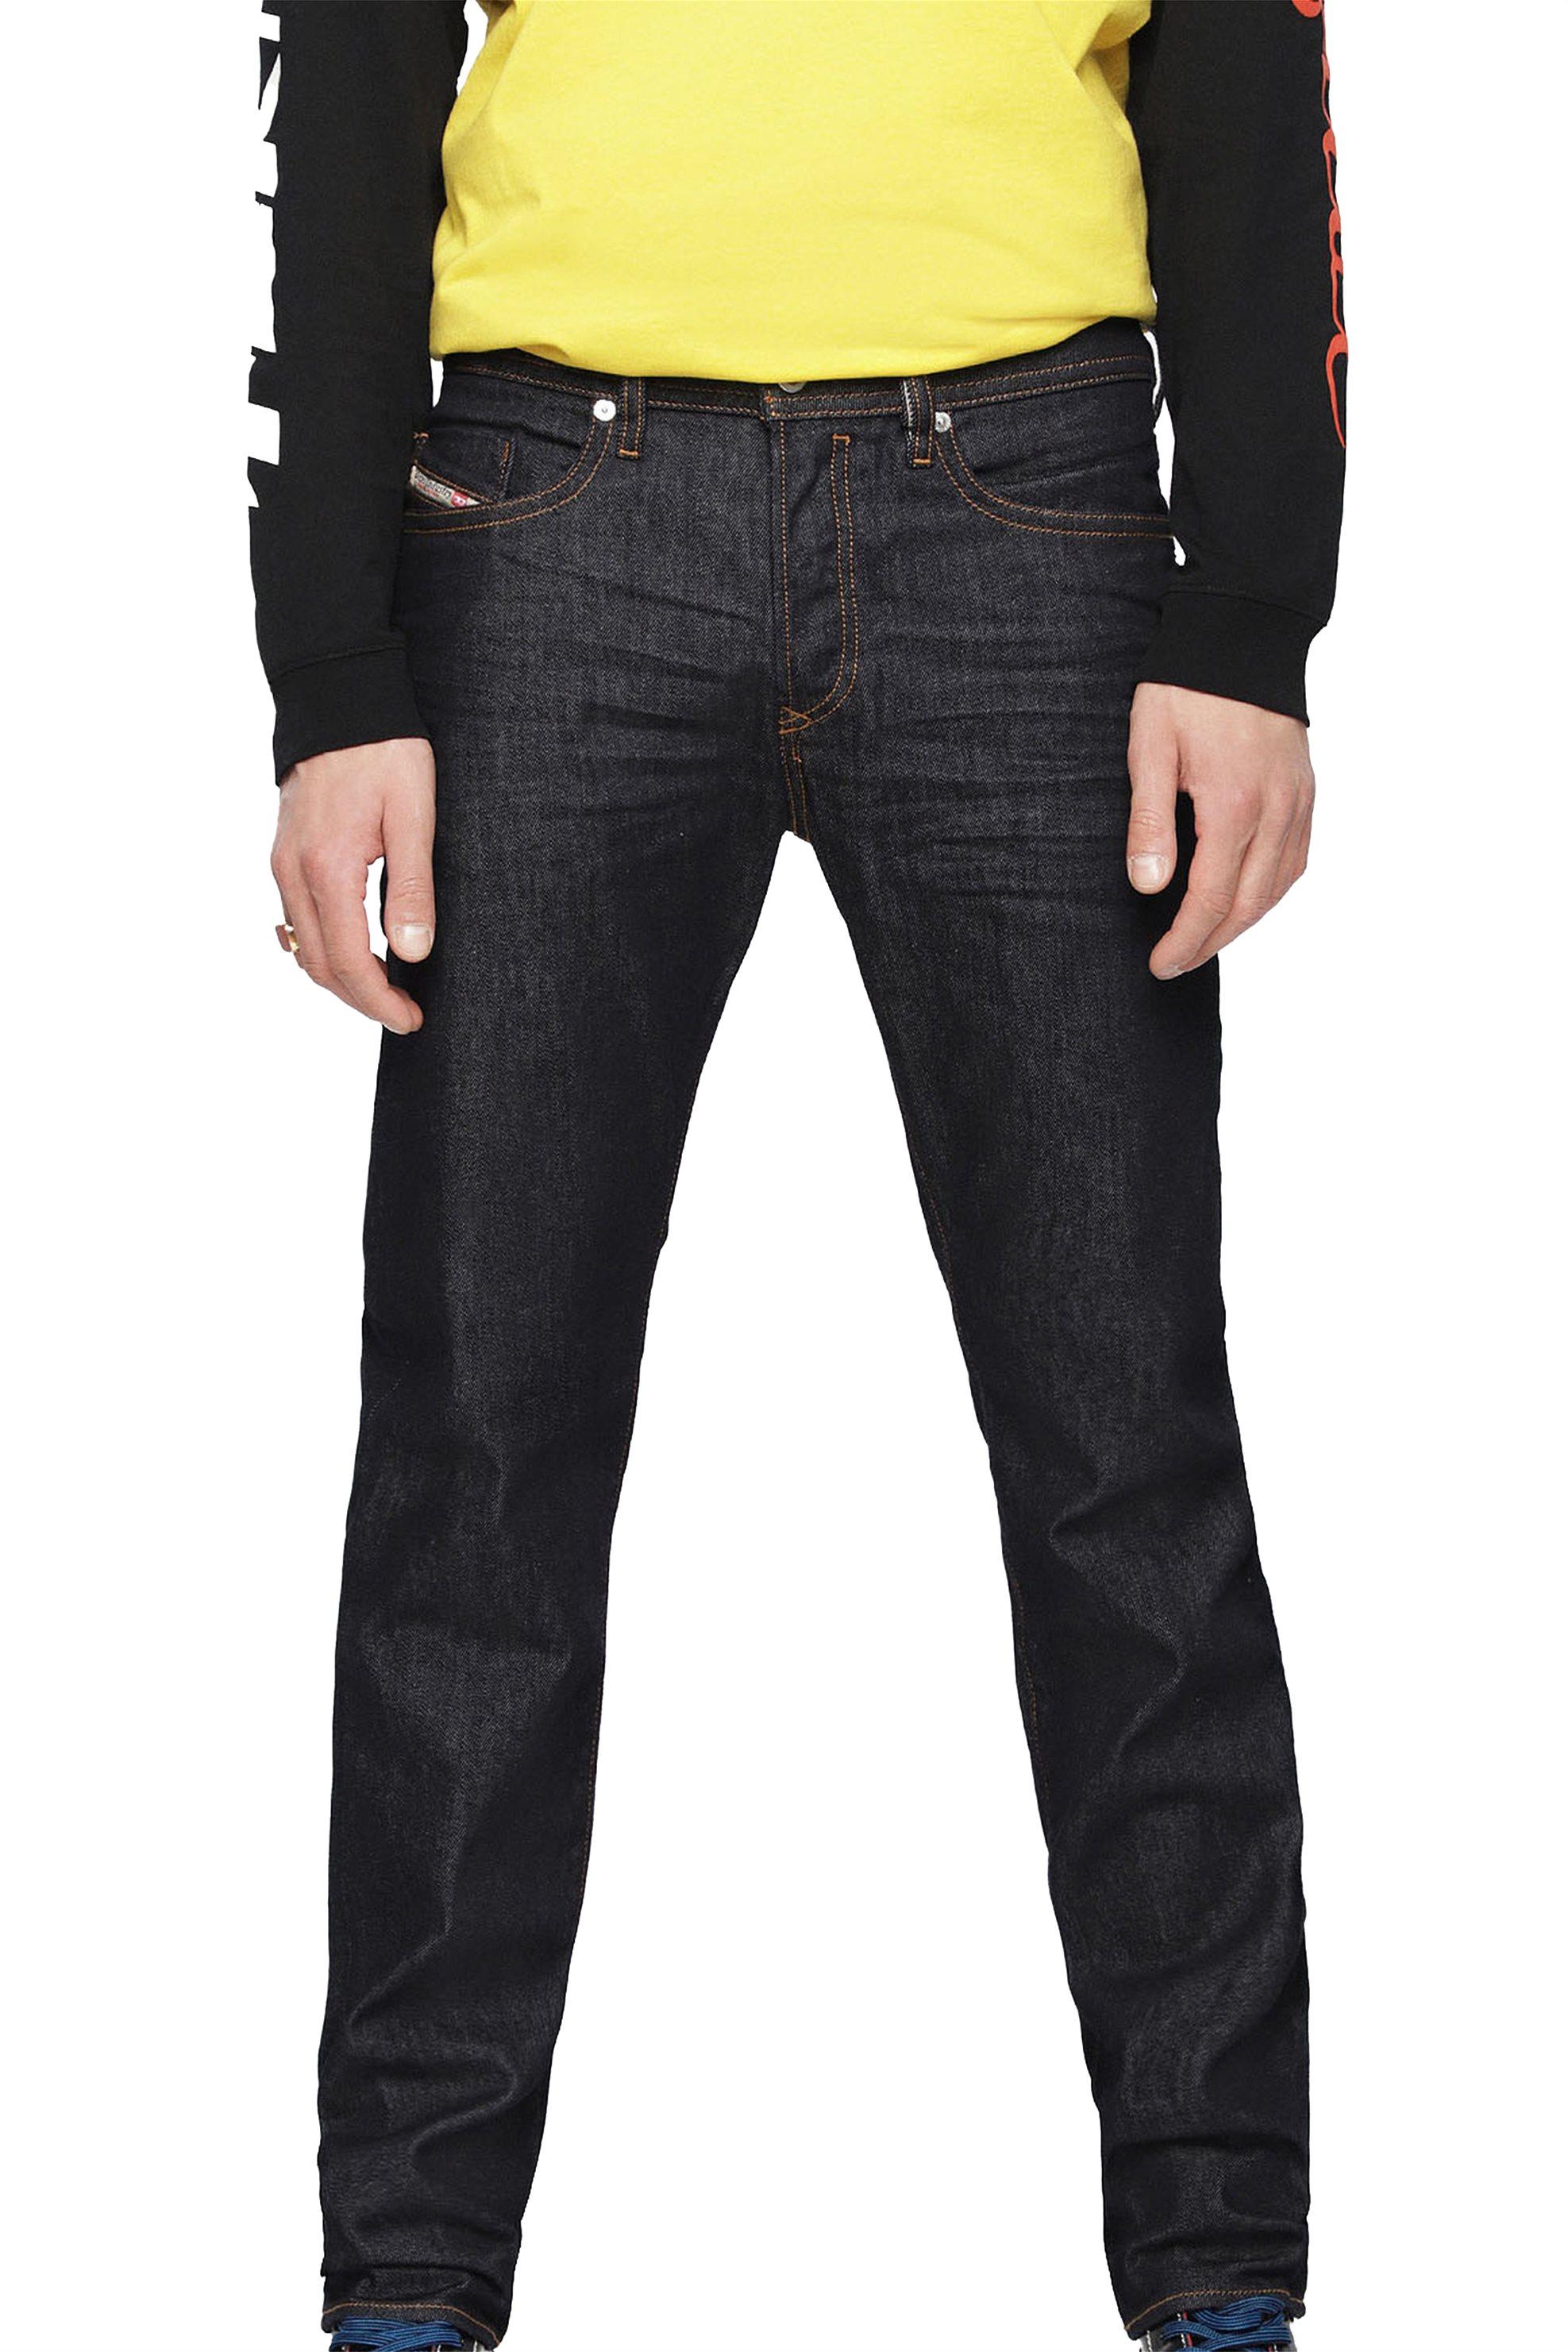 Diesel ανδρικό τζην παντελόνι Buster 084HN (32L) - 00SDHB 084HN - Μπλε Σκούρο ανδρασ   ρουχα   jeans   tapered